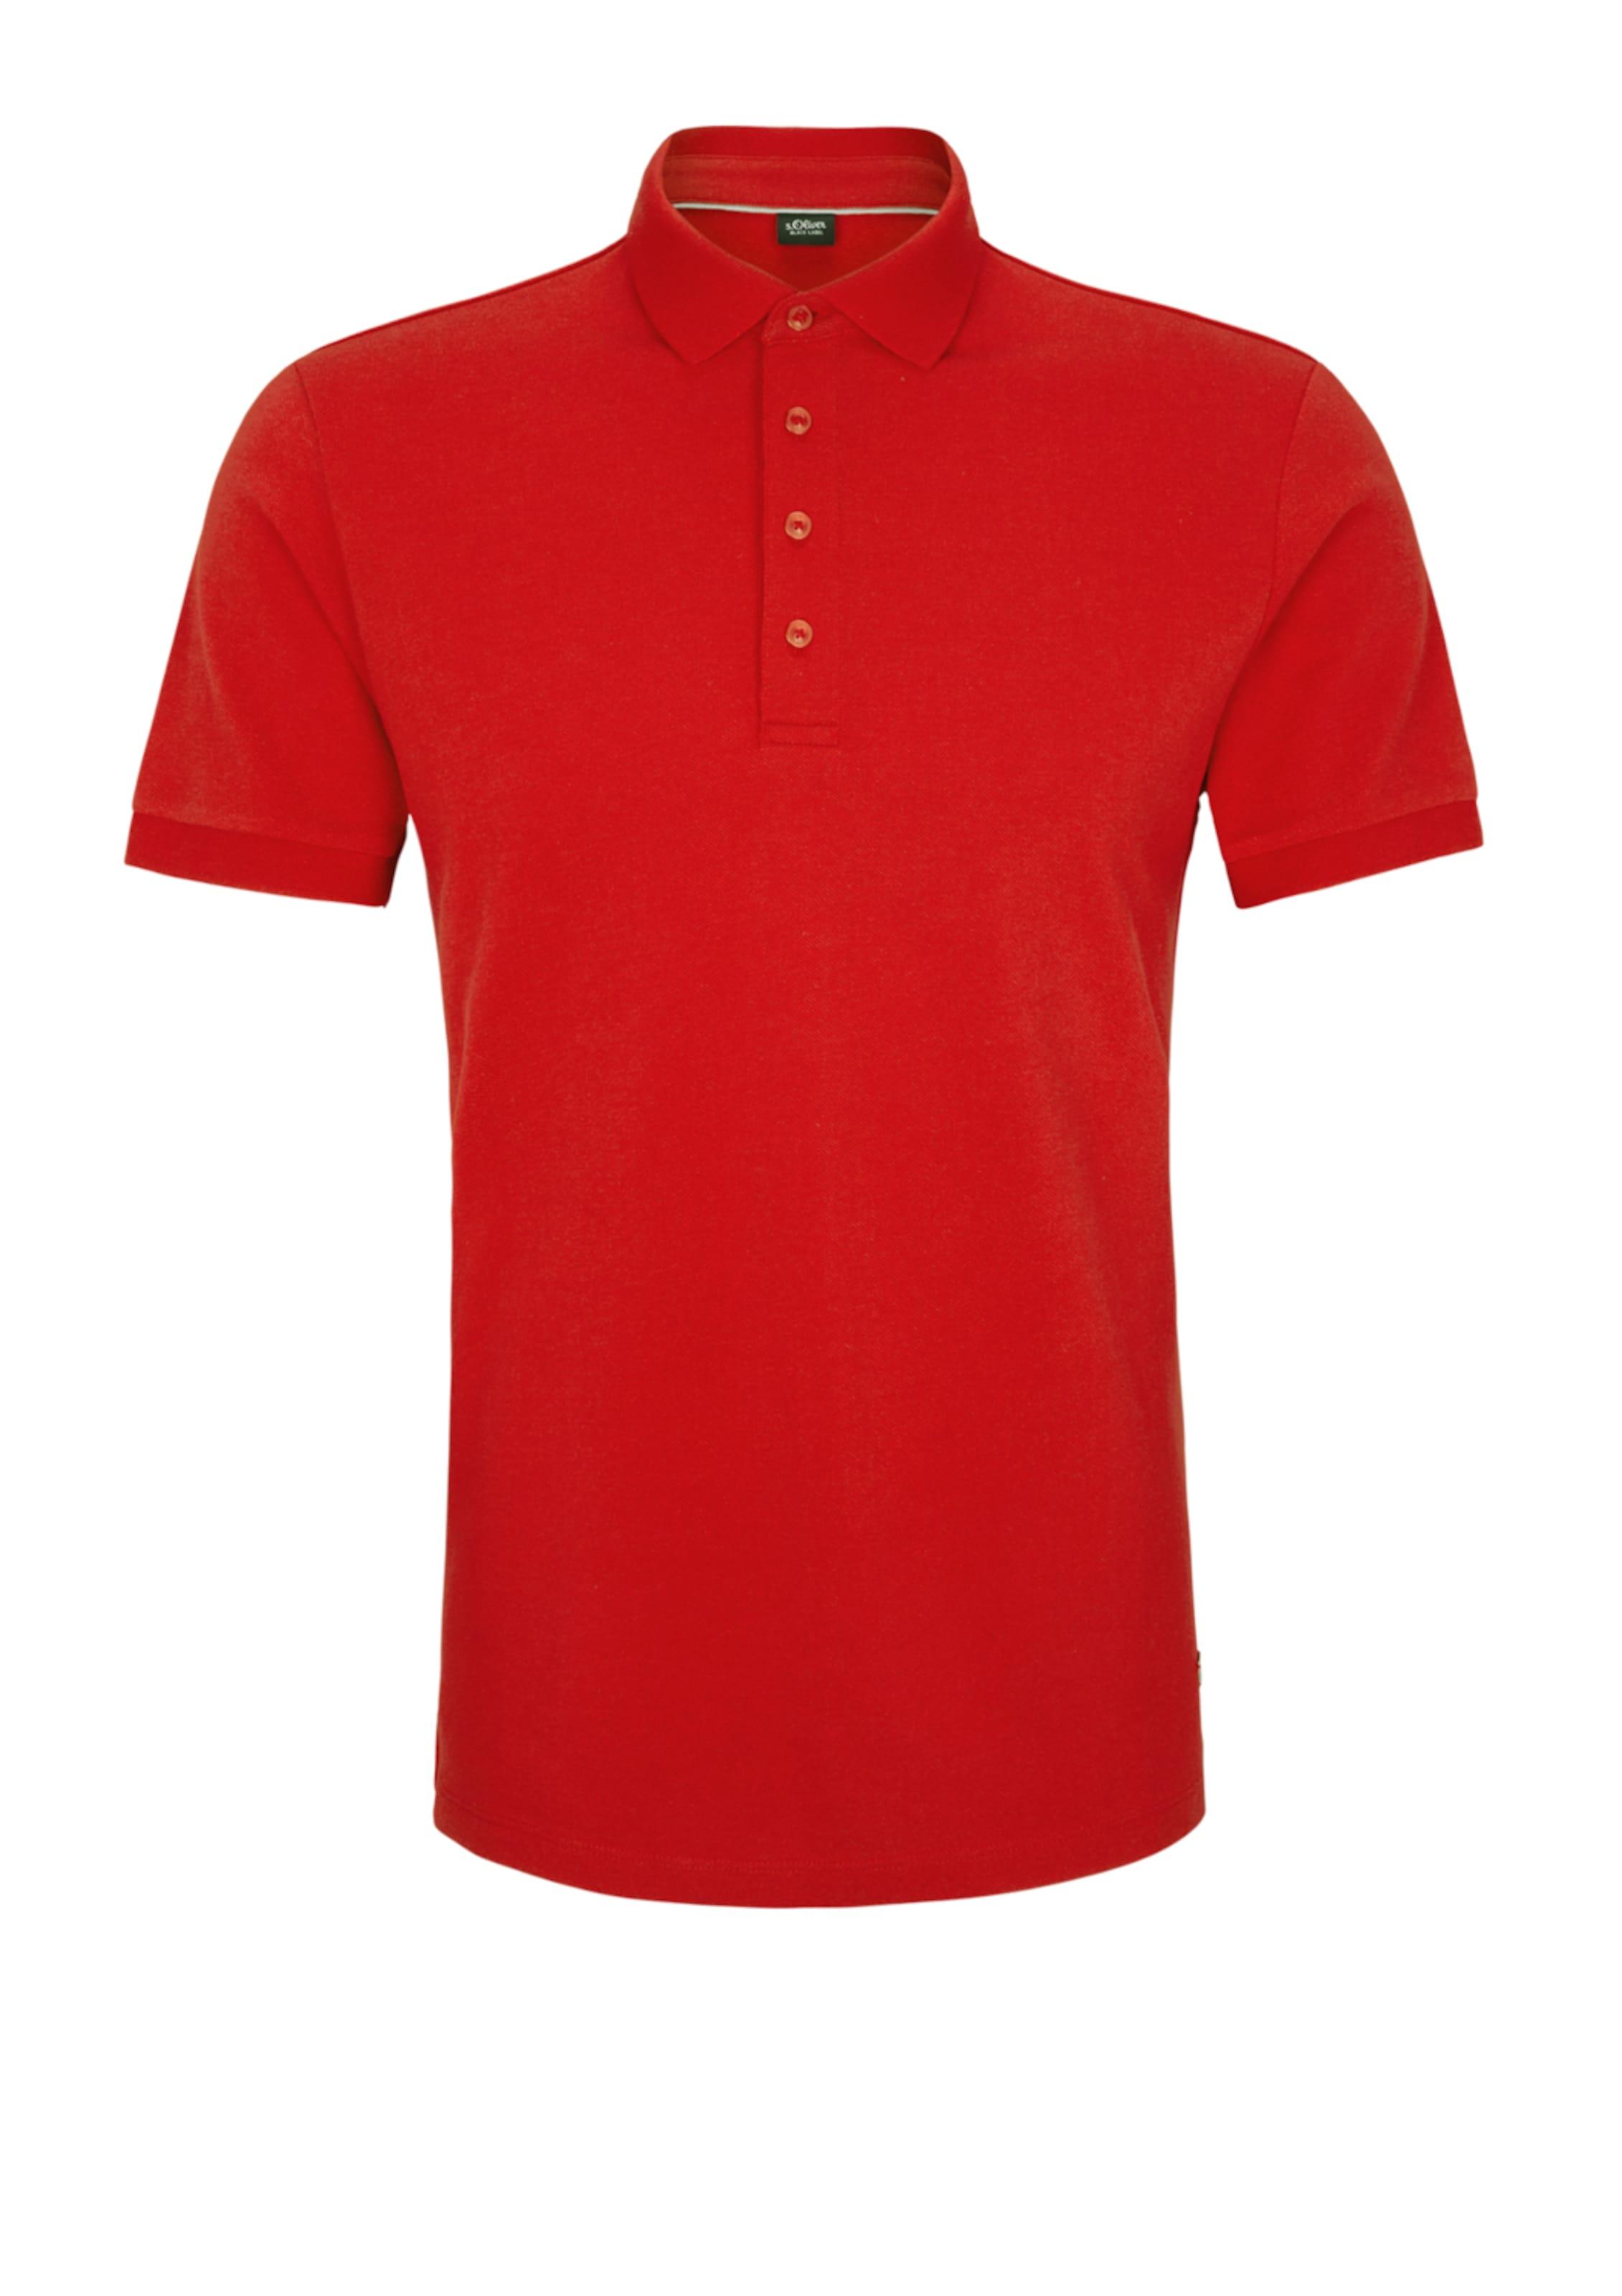 S In Label oliver Black Feuerrot Poloshirt 1cTKlFJ